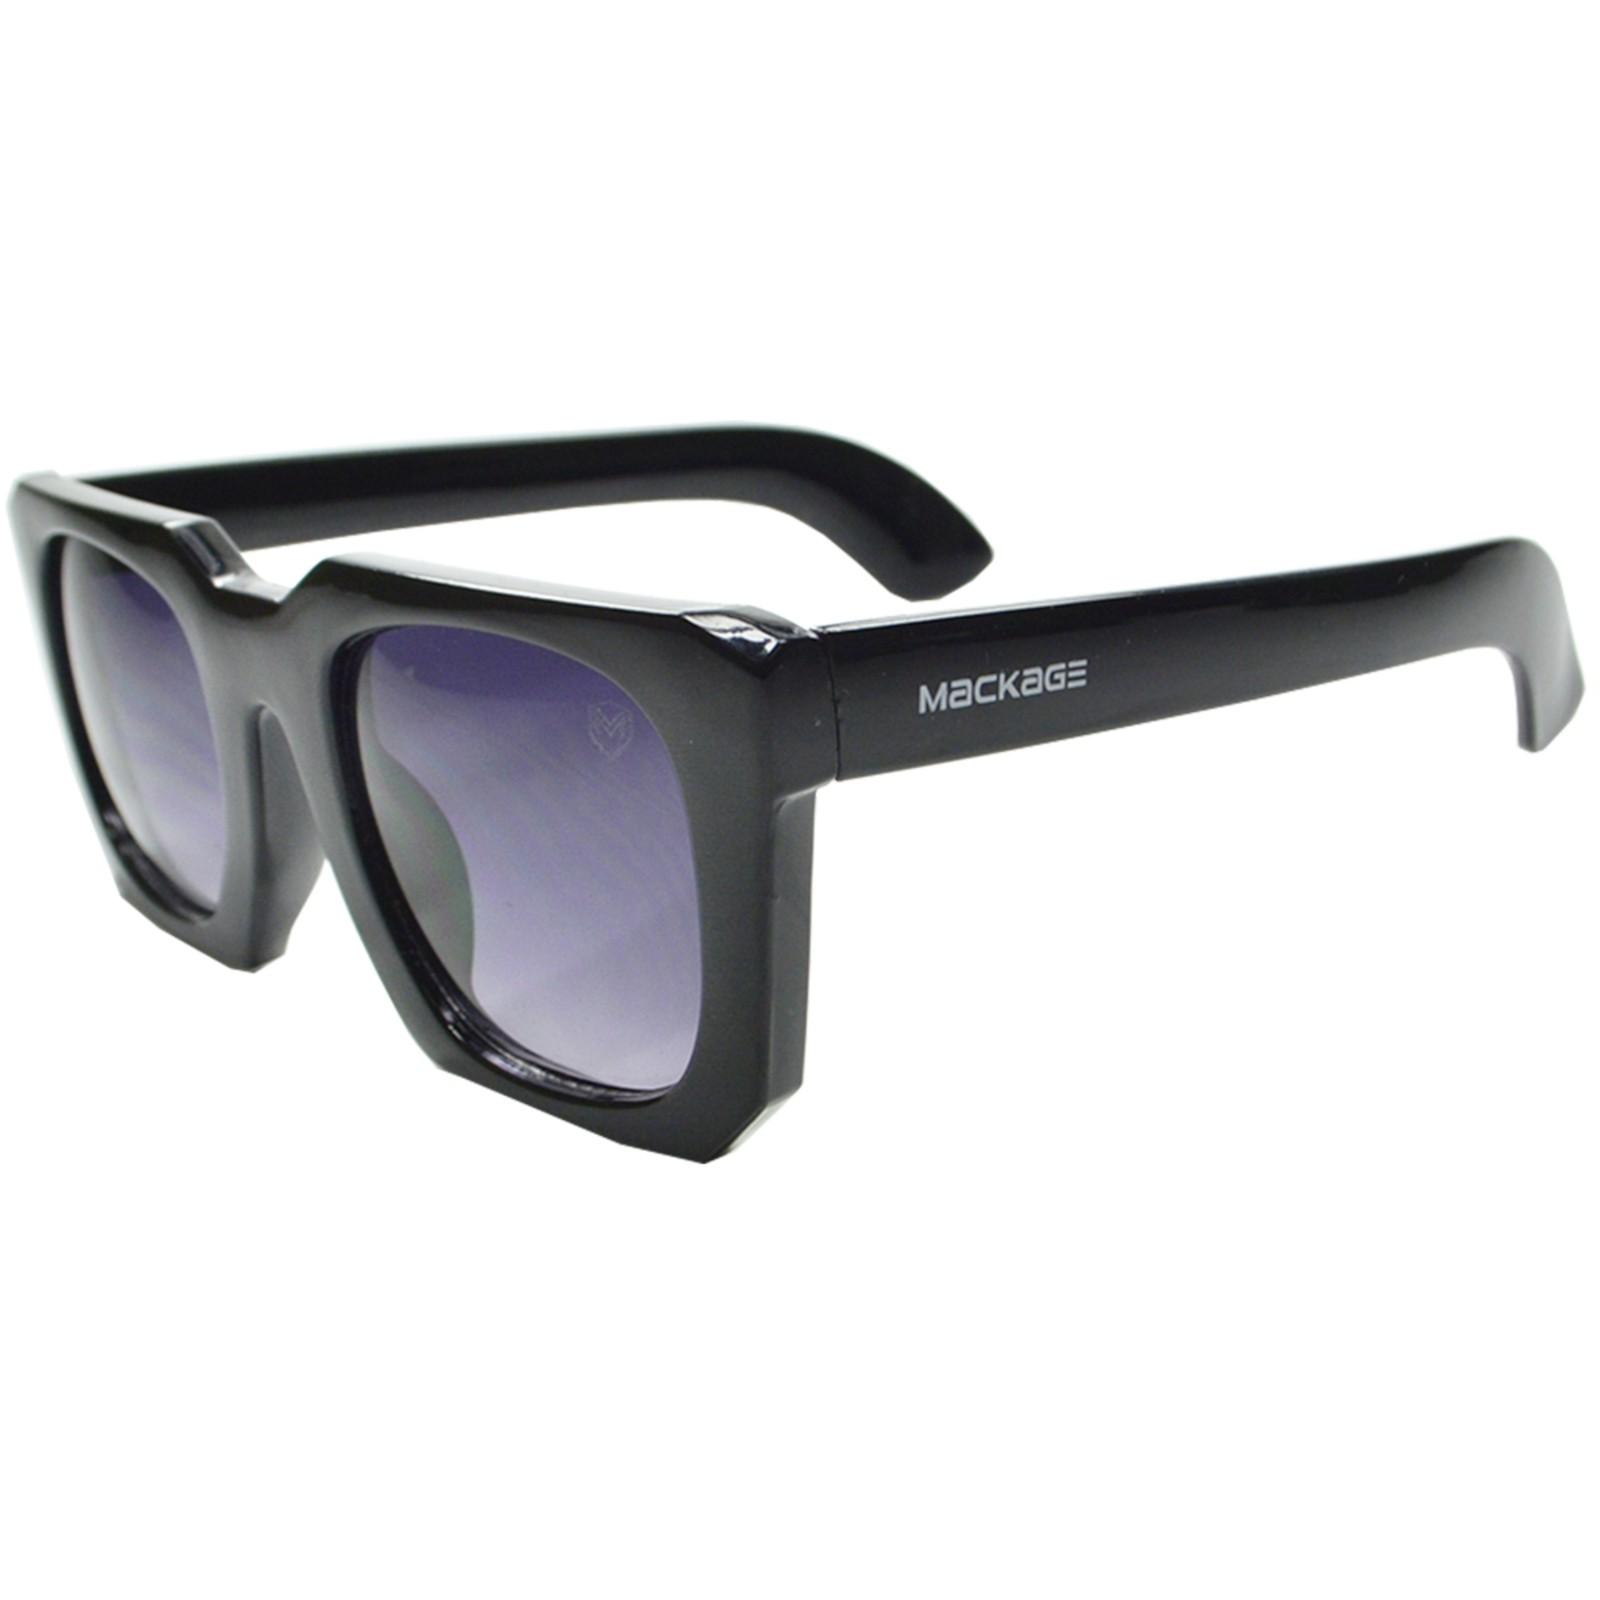 Óculos De Sol Mackage Feminino Quadrado Retrô - Preto